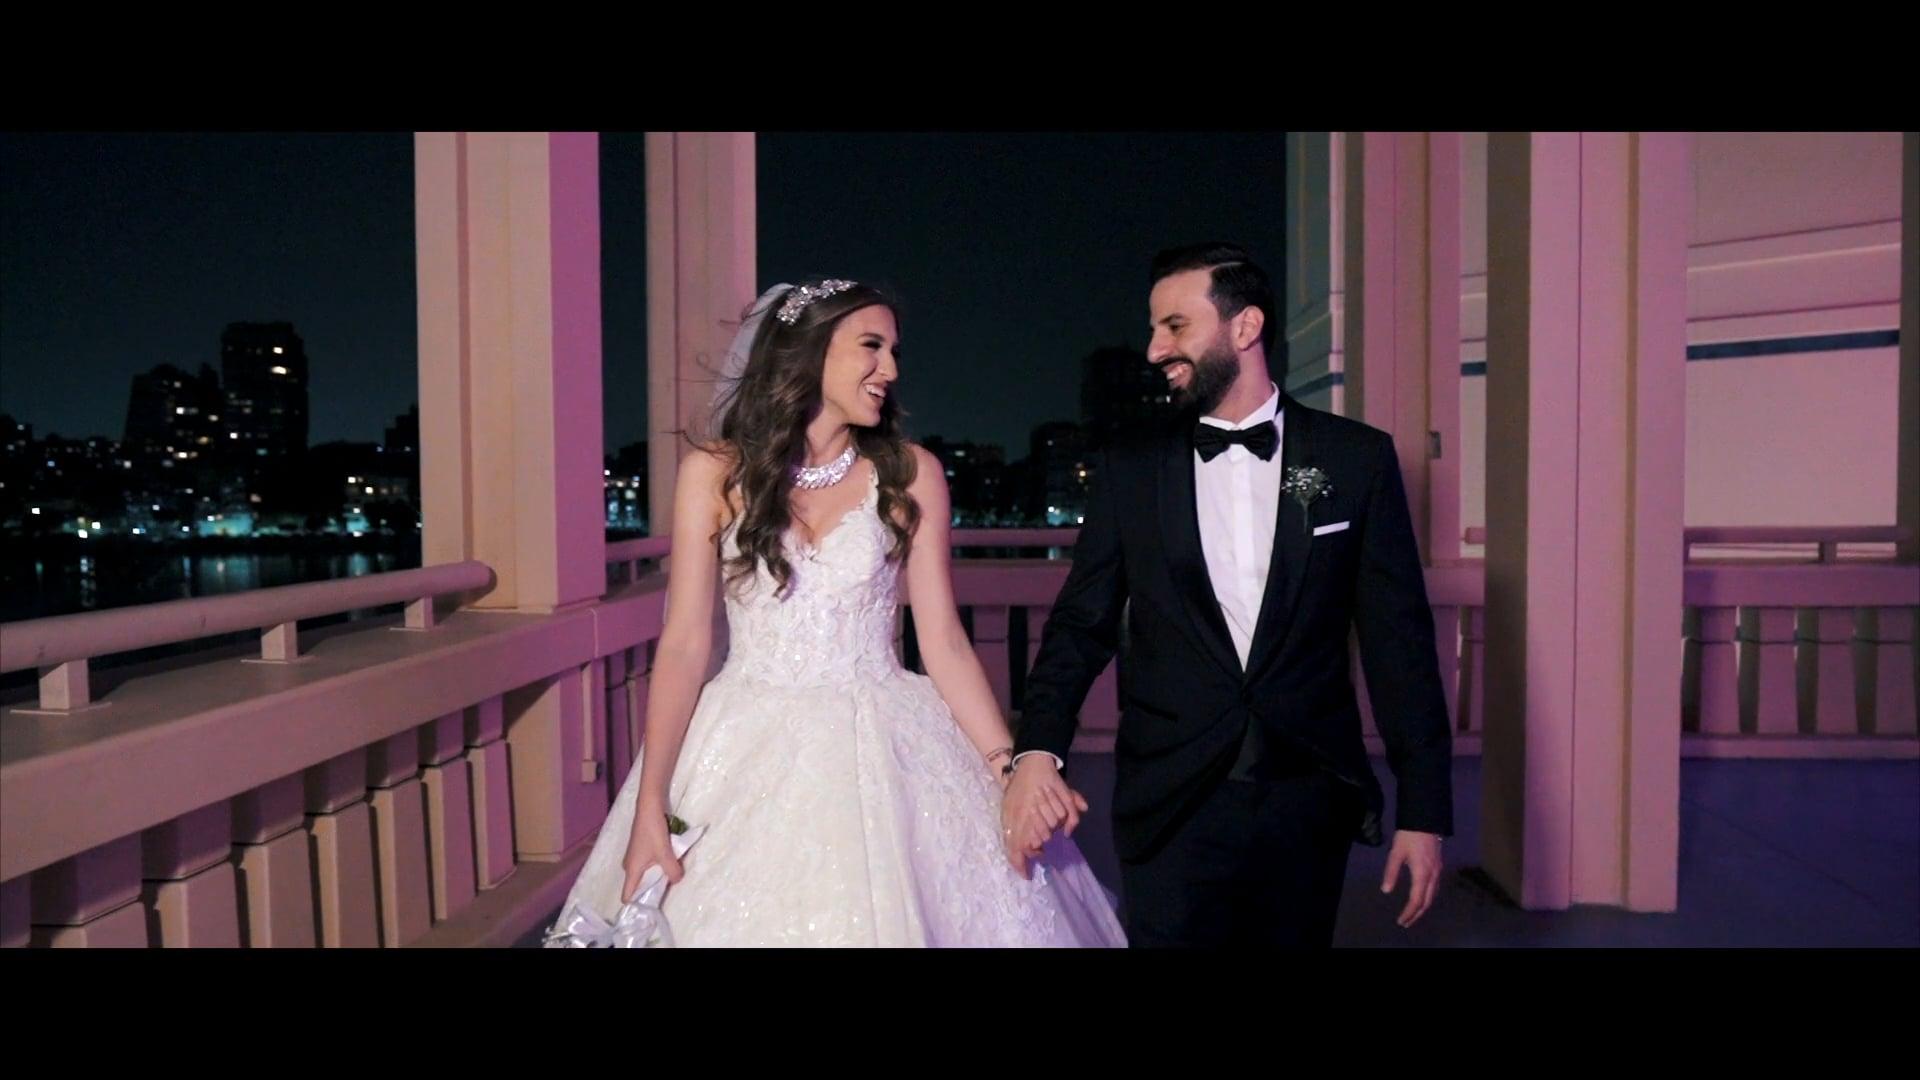 NADA & MOUSTAFA WEDDING FILM